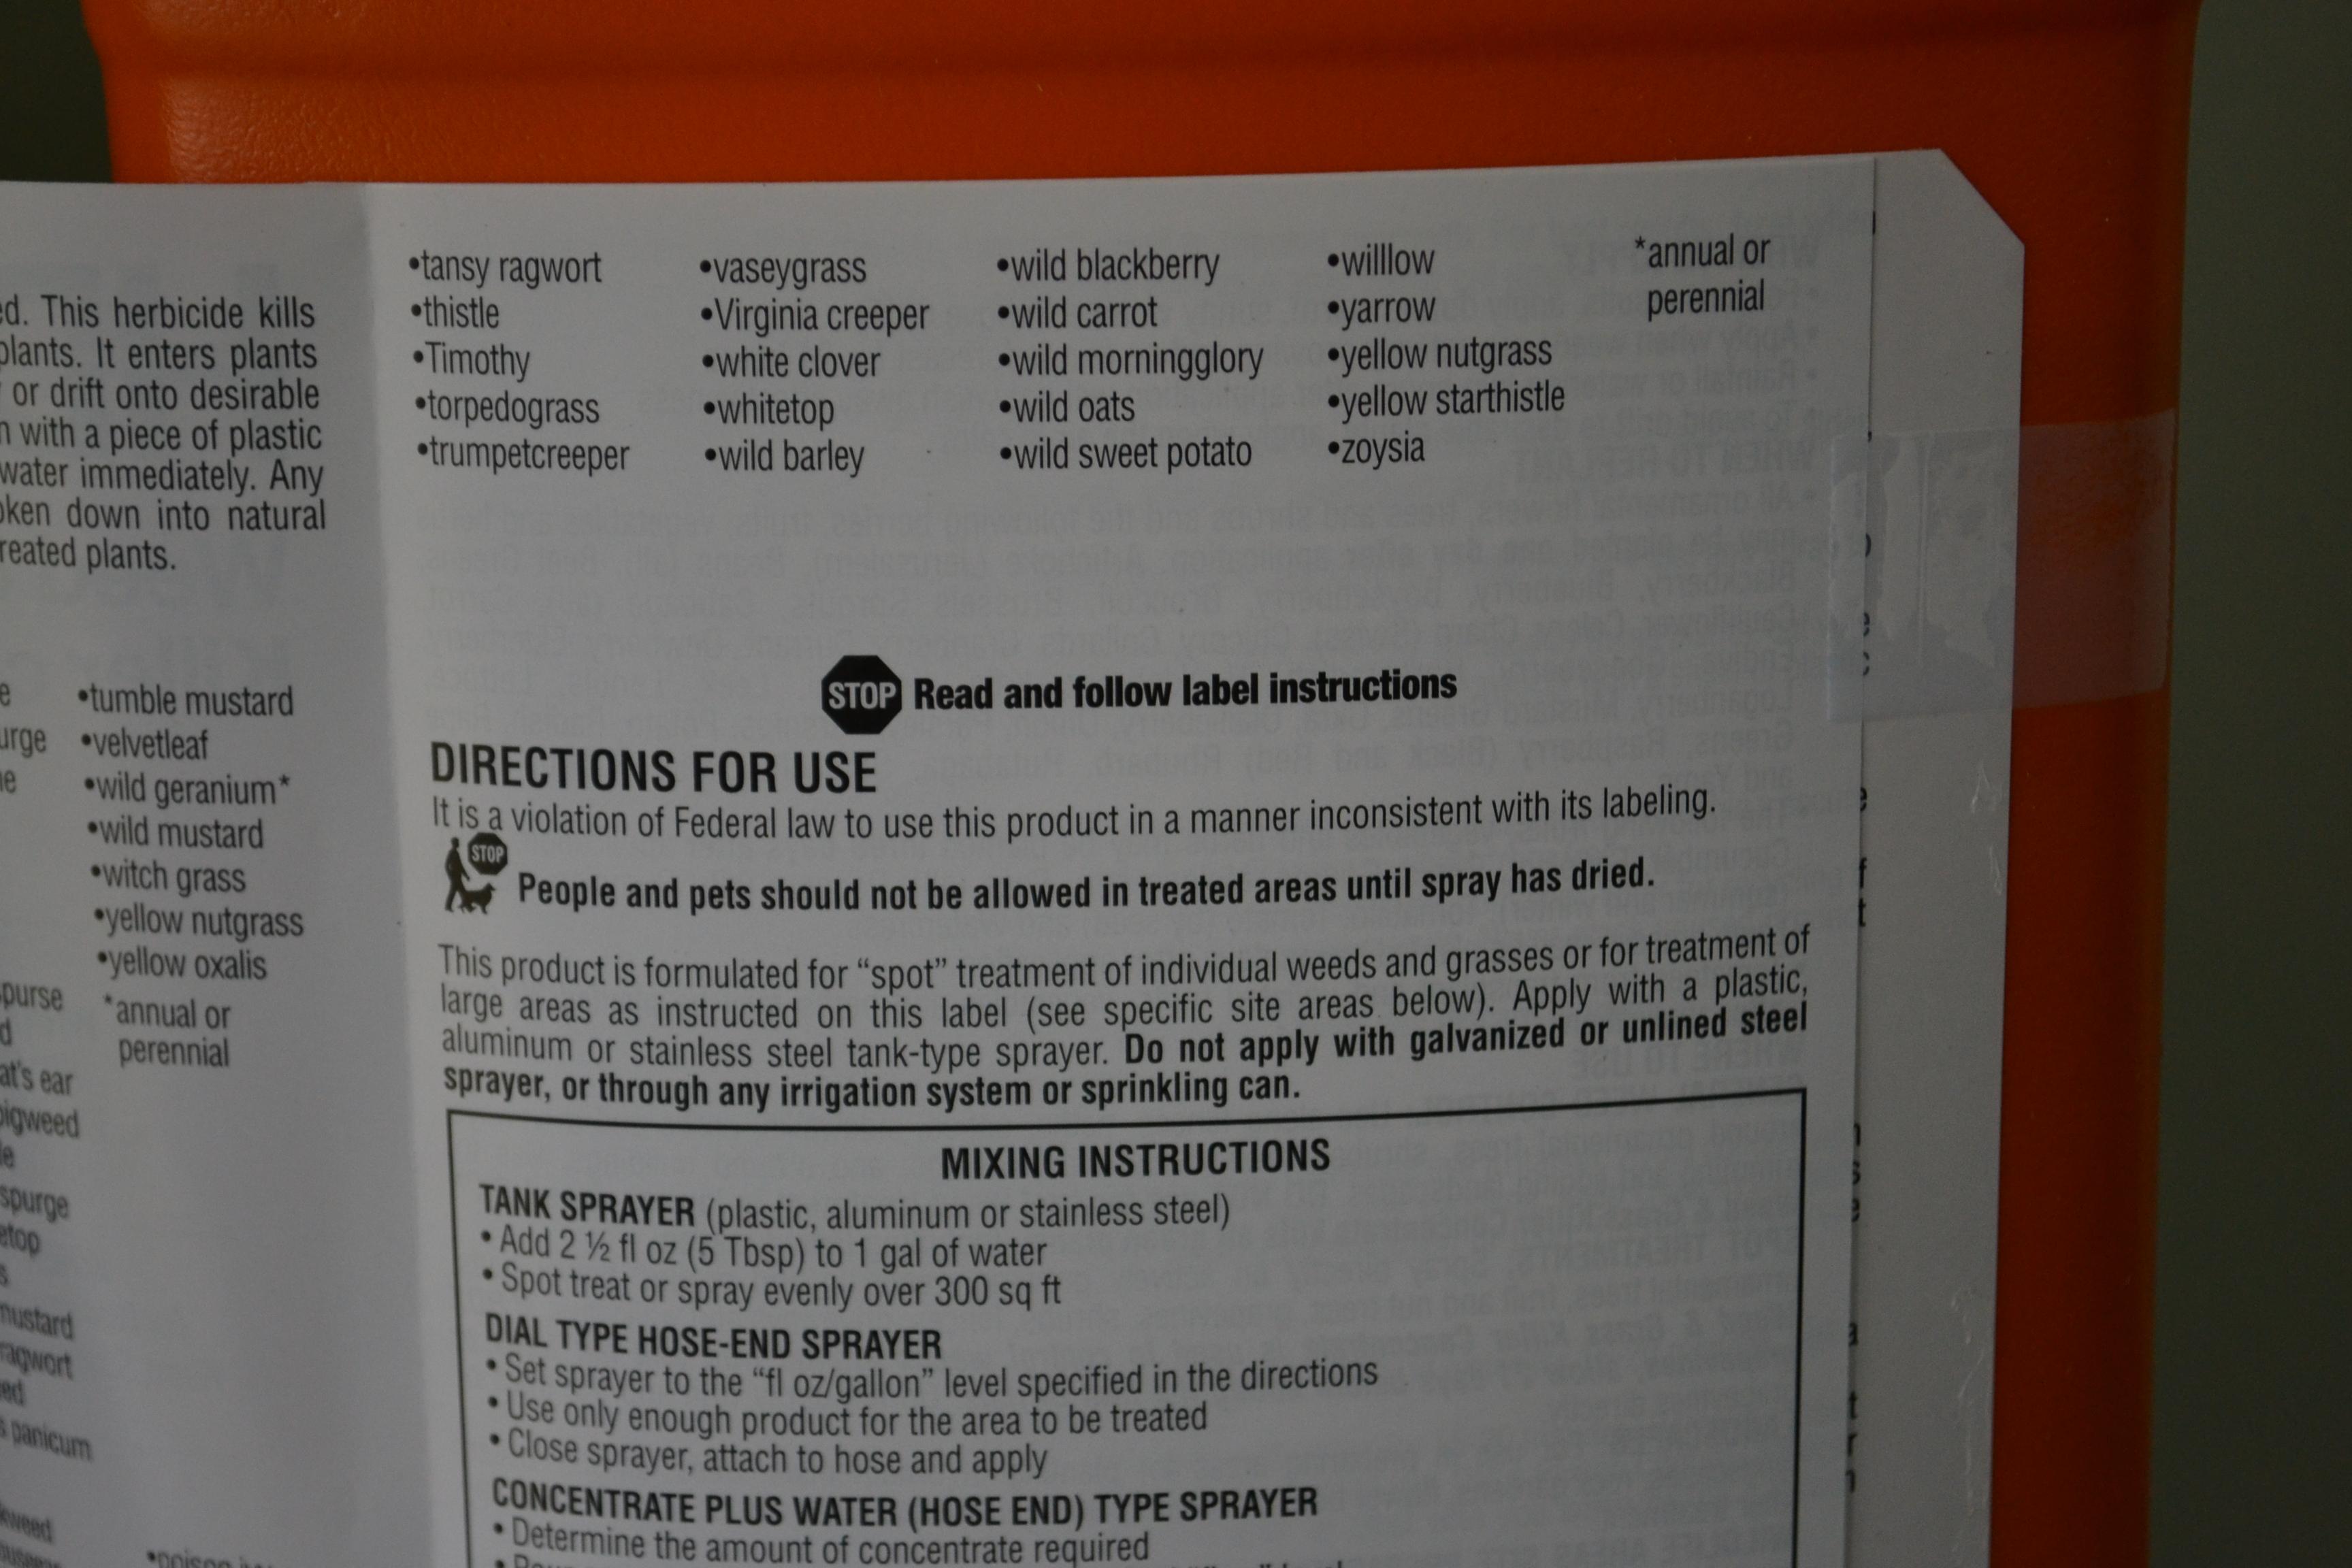 Pesticide Safety Tips